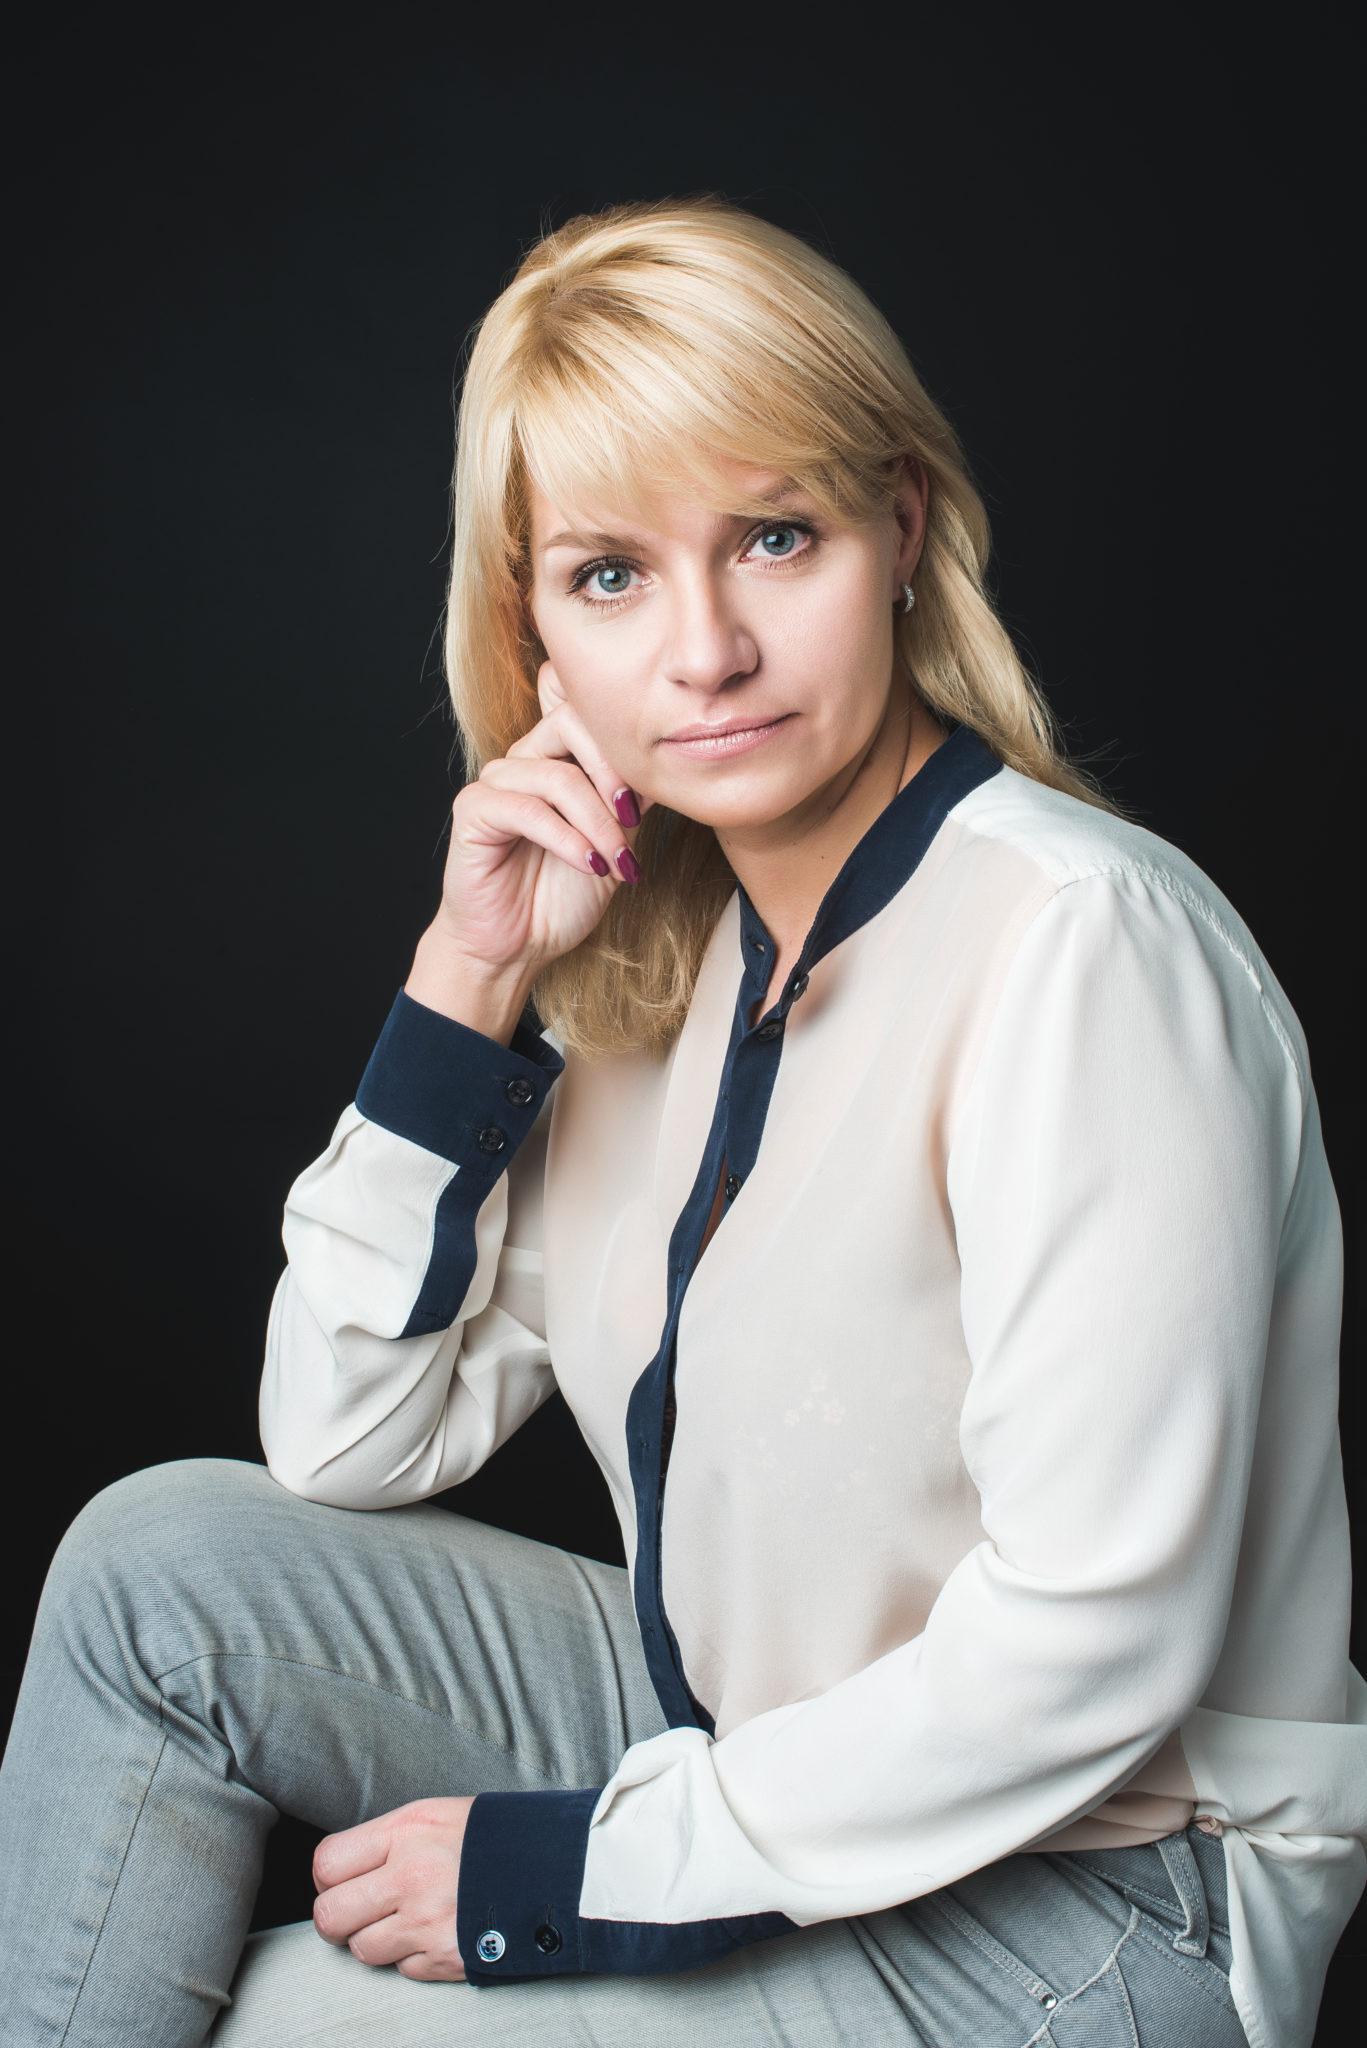 Наталья Гумаровна Скаландис, управляющий партнер